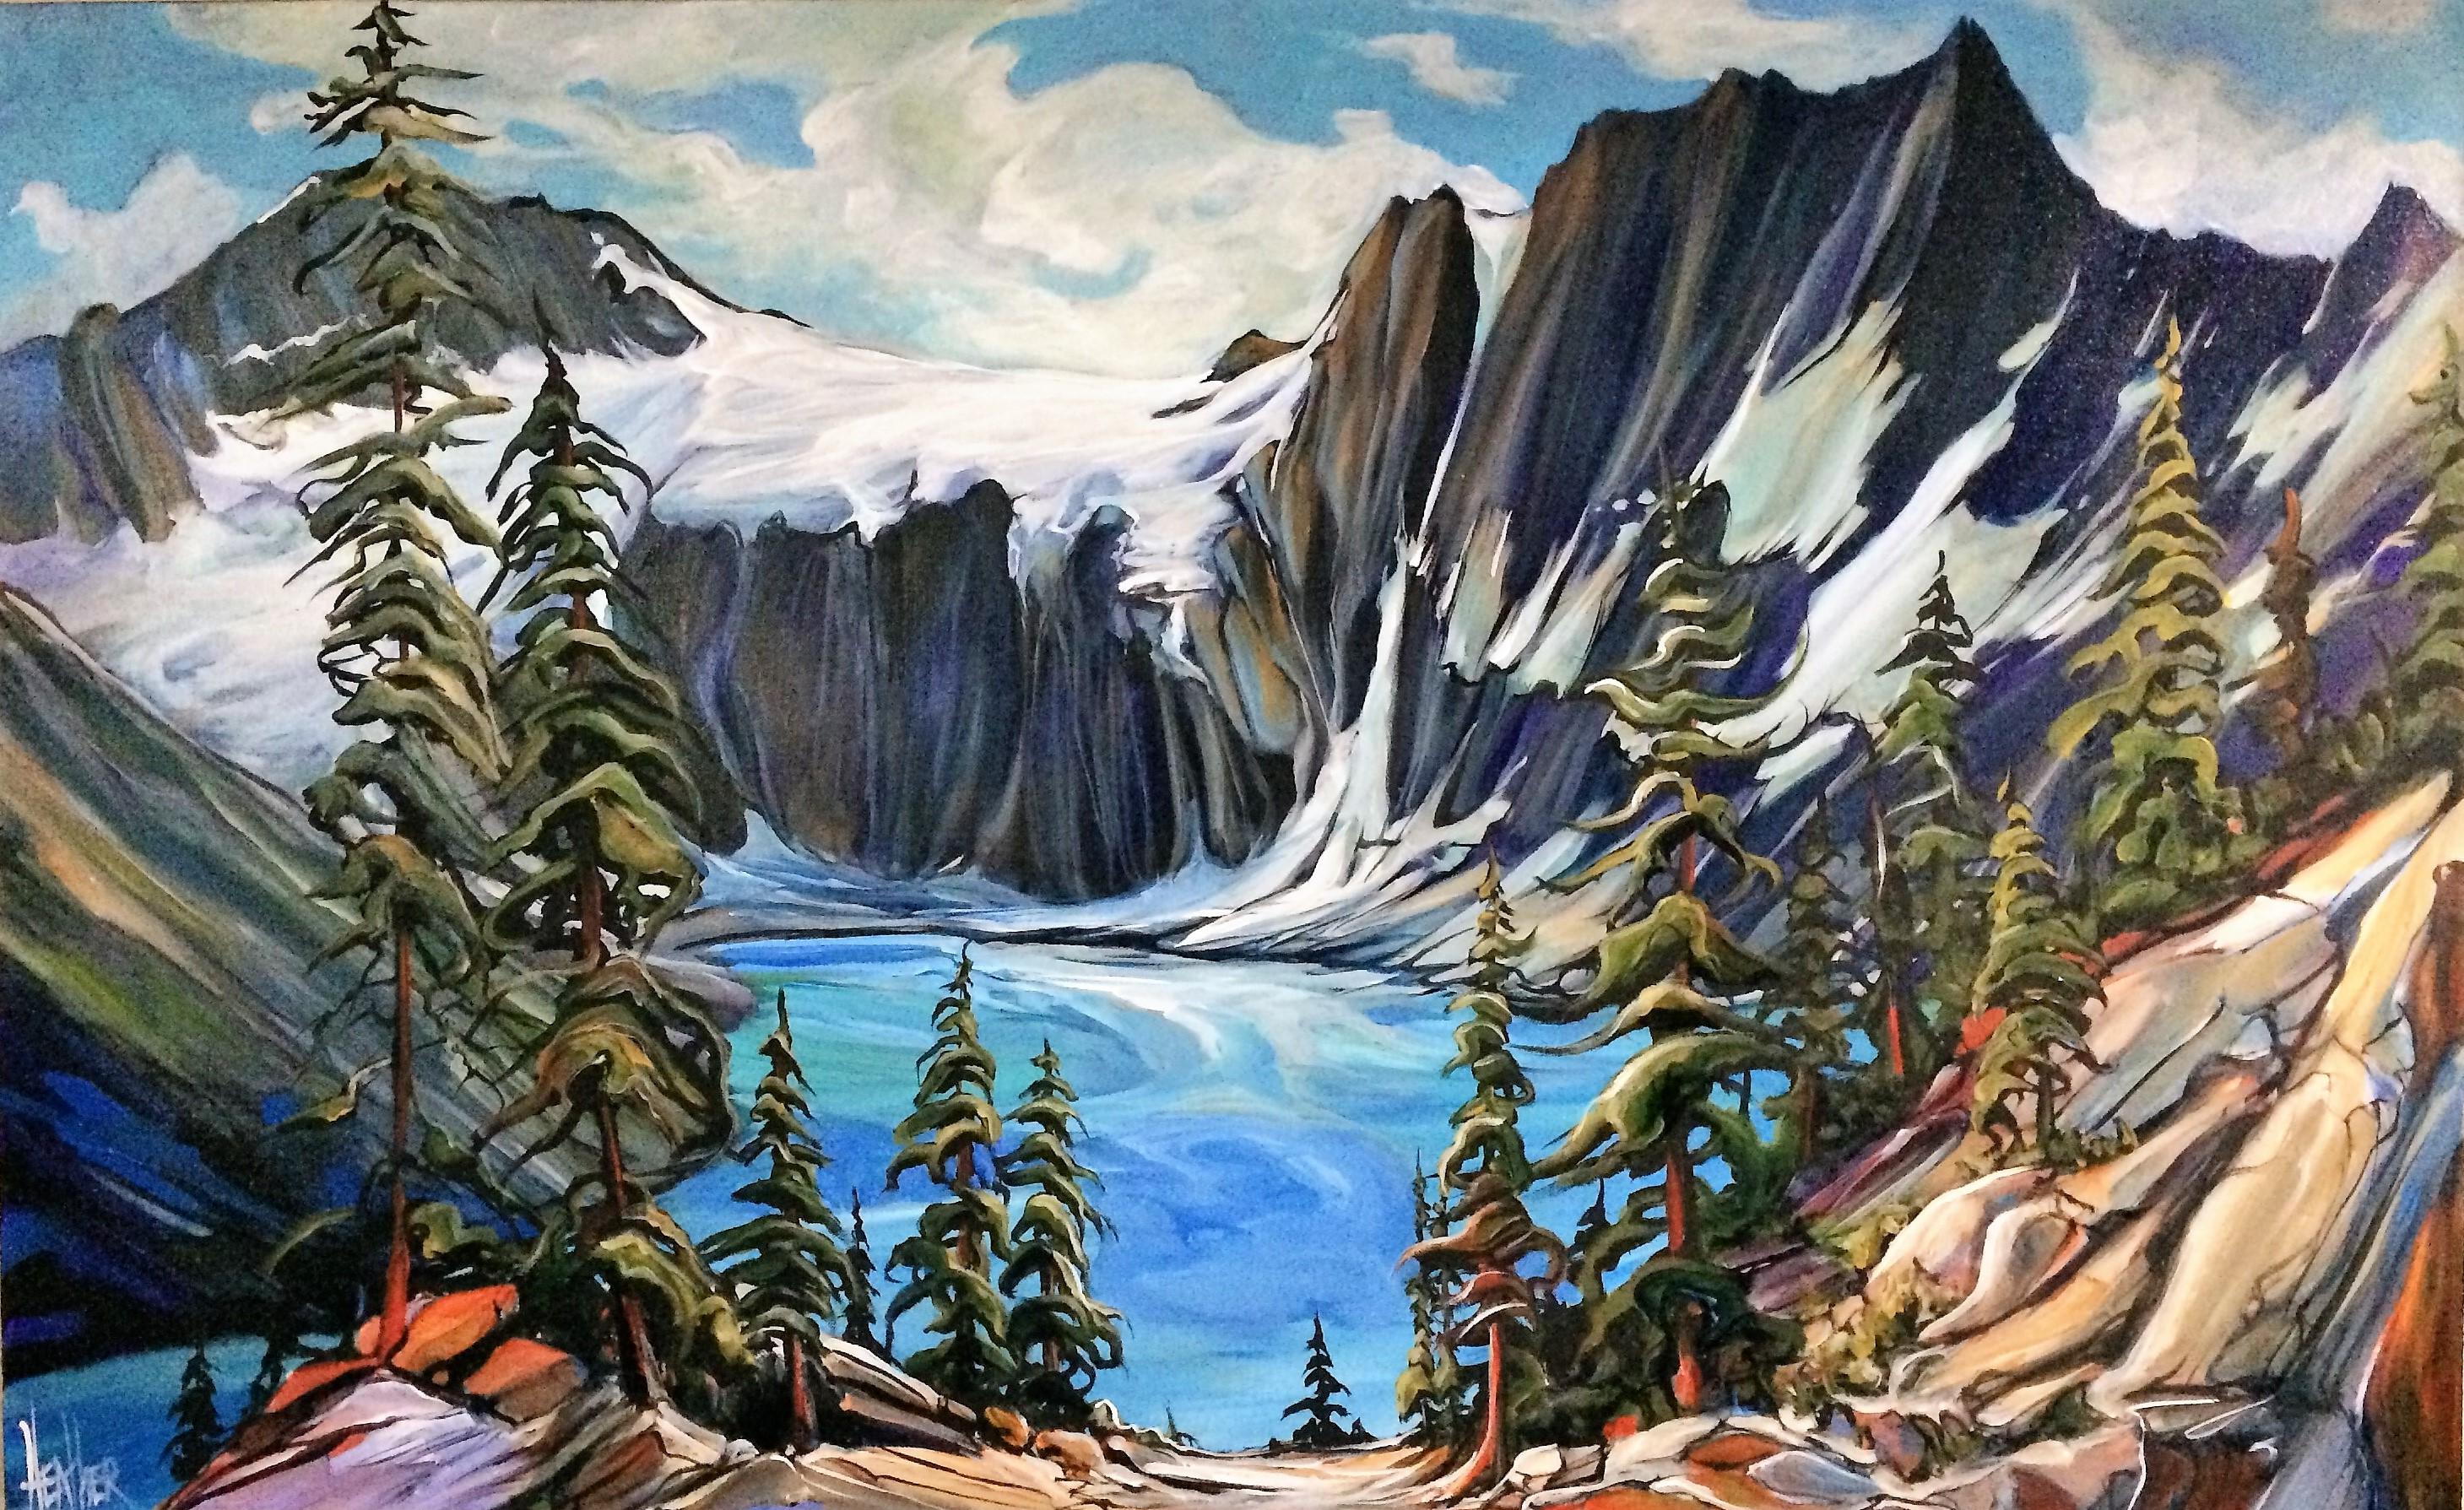 Lake of the Hanging Glacier 30 x 48